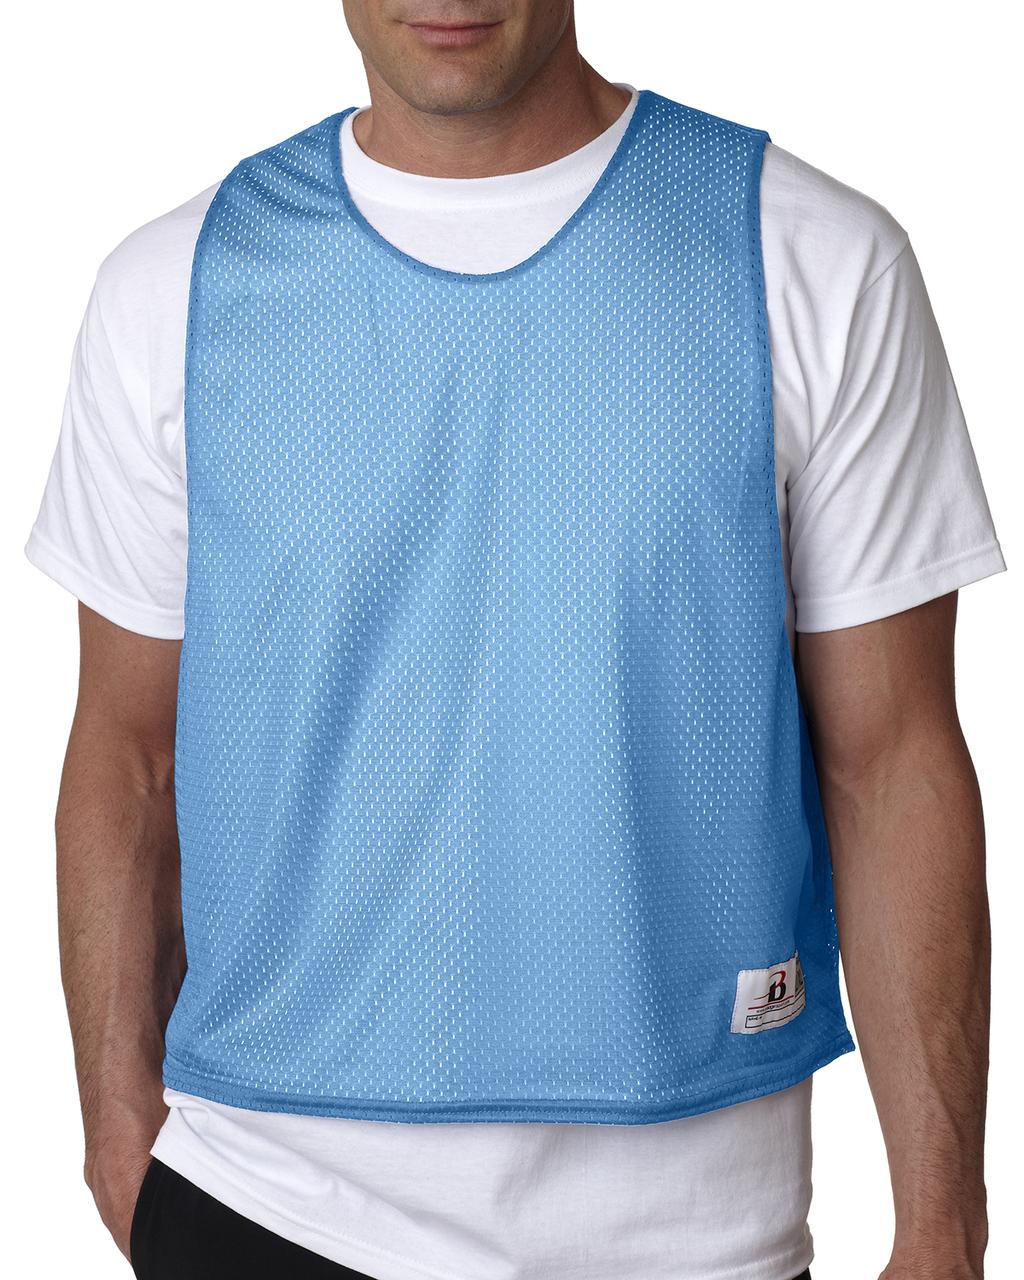 Reversible Mesh Lacrosse Jersey